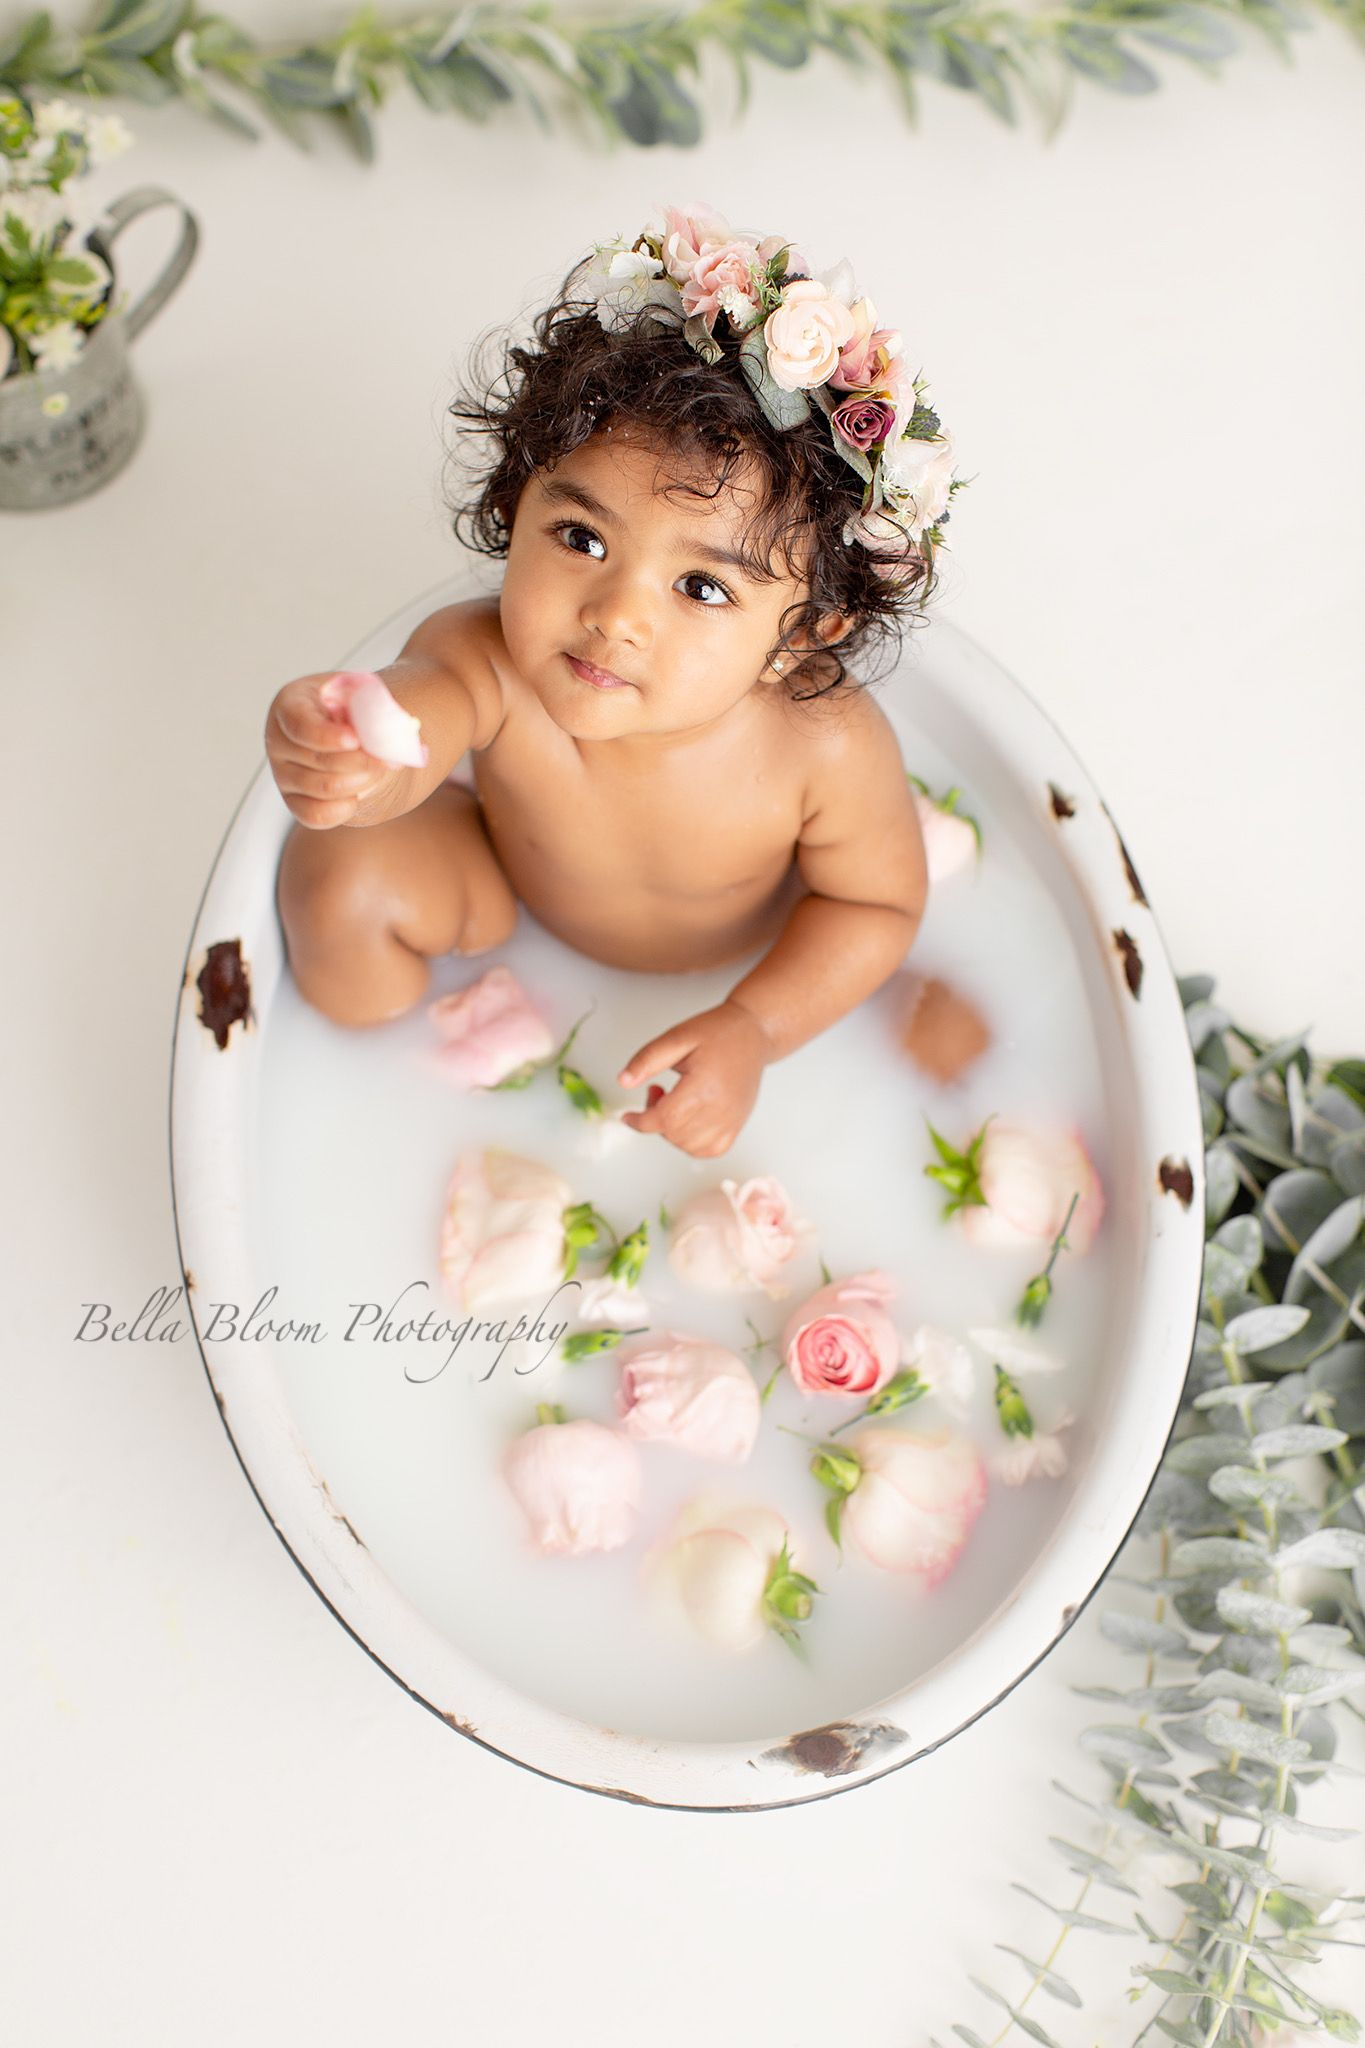 Floral Milk Bath  #fallmilkbath